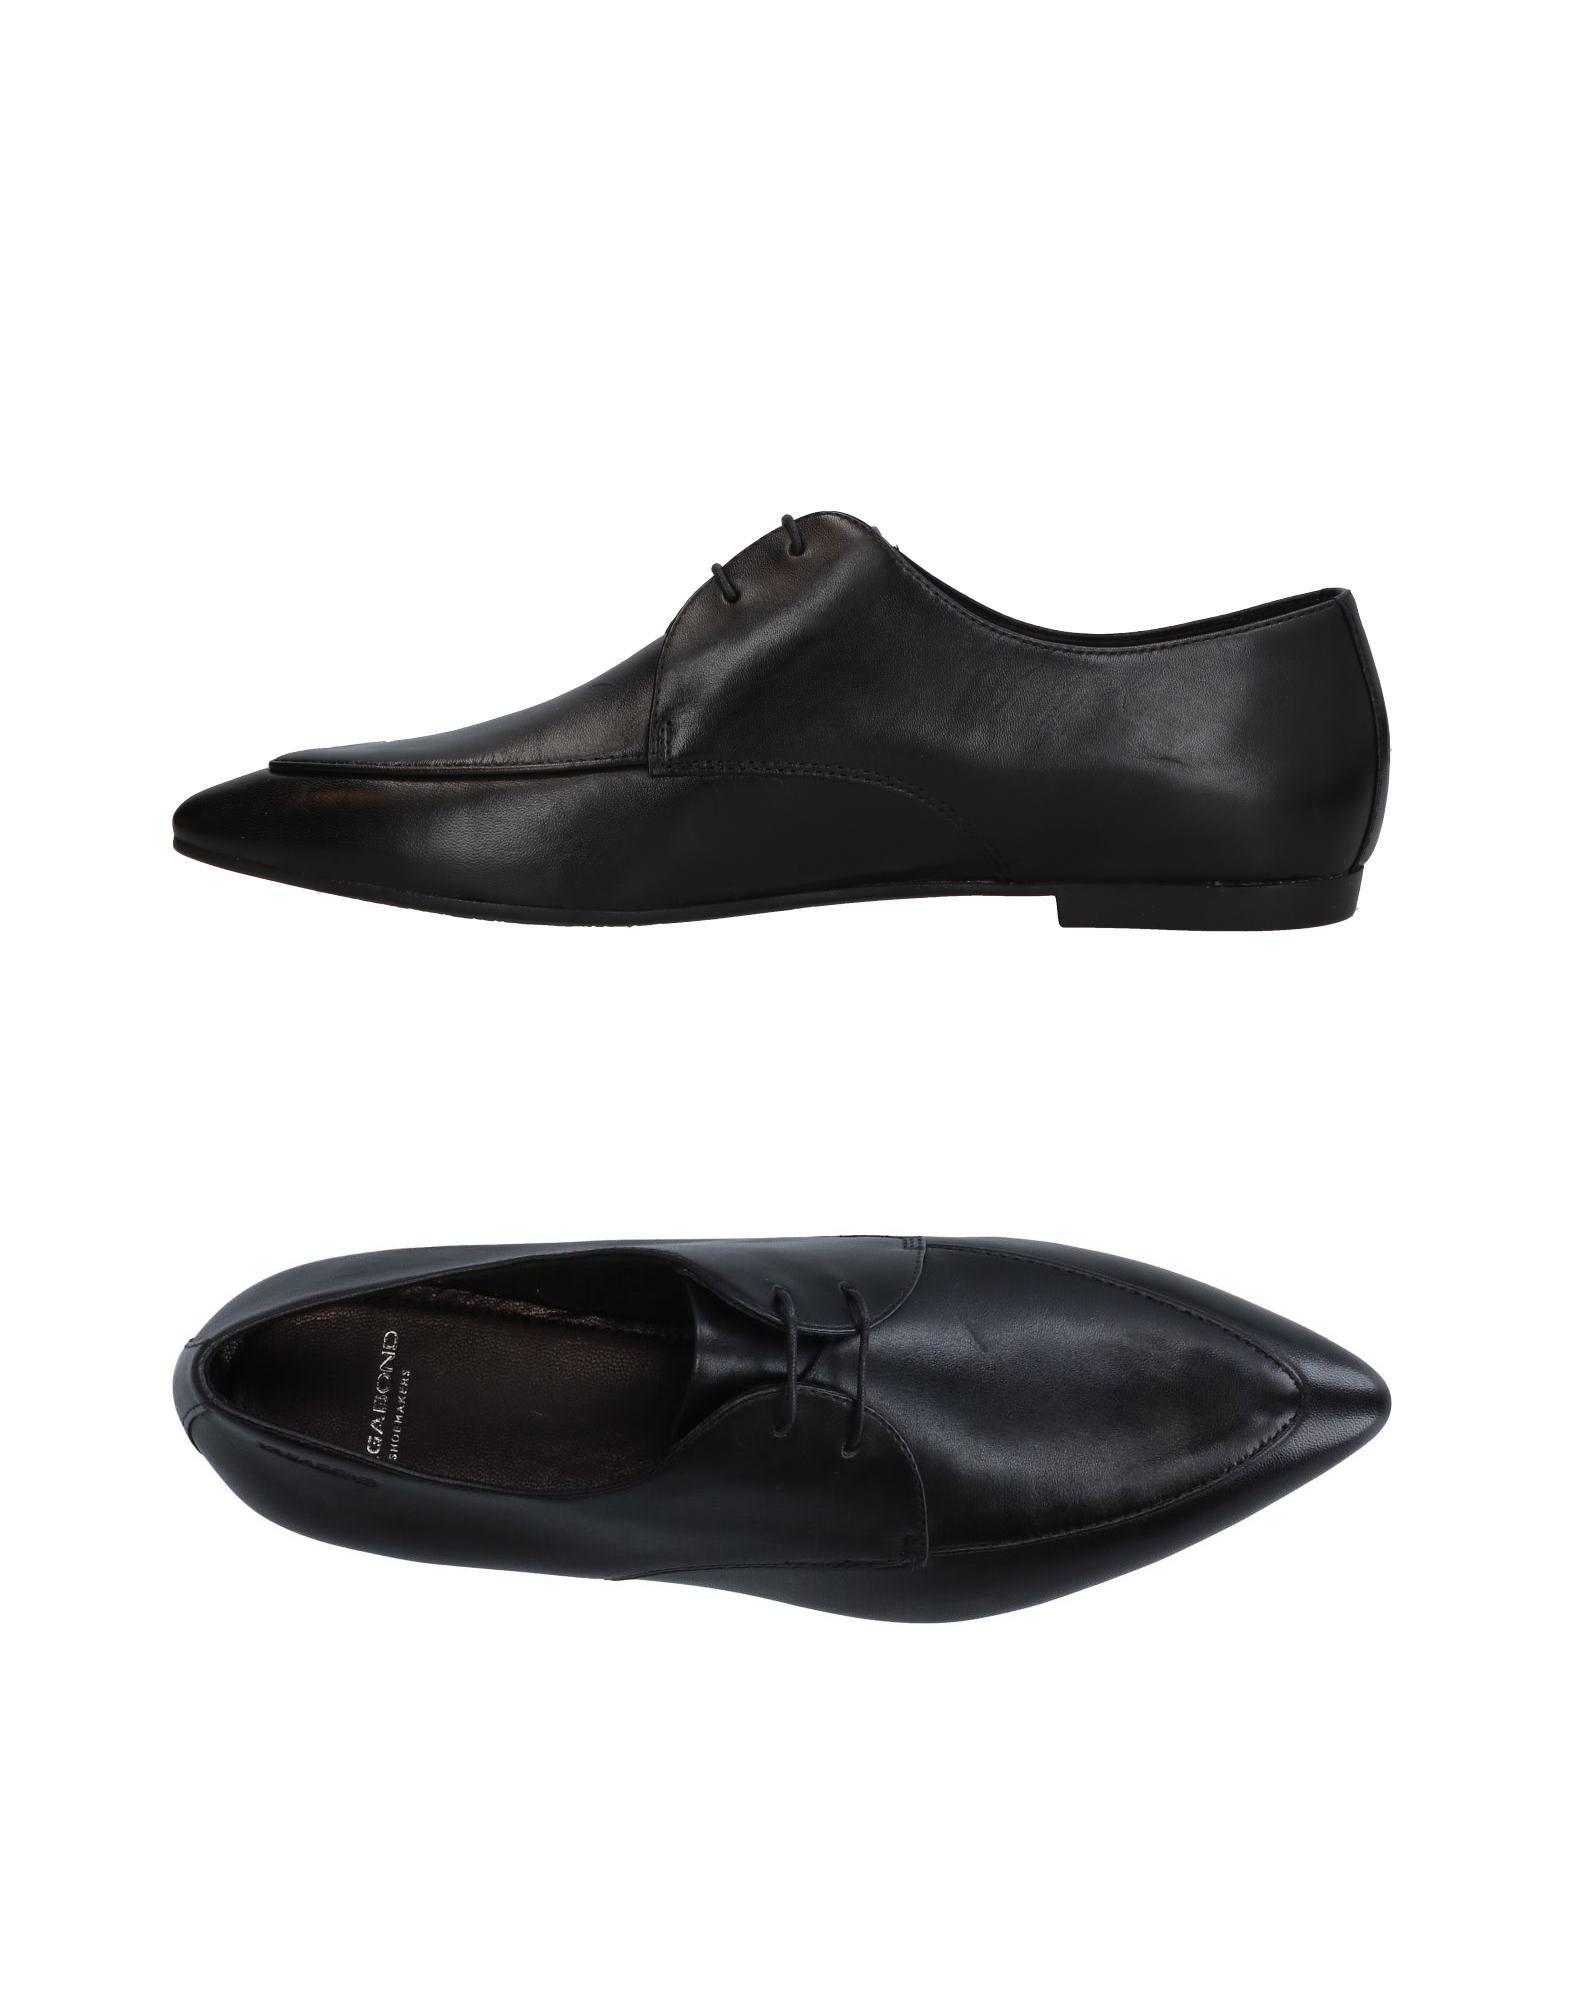 Vagabond Shoemakers Schnürschuhe Damen  11321648EA Gute Qualität beliebte Schuhe